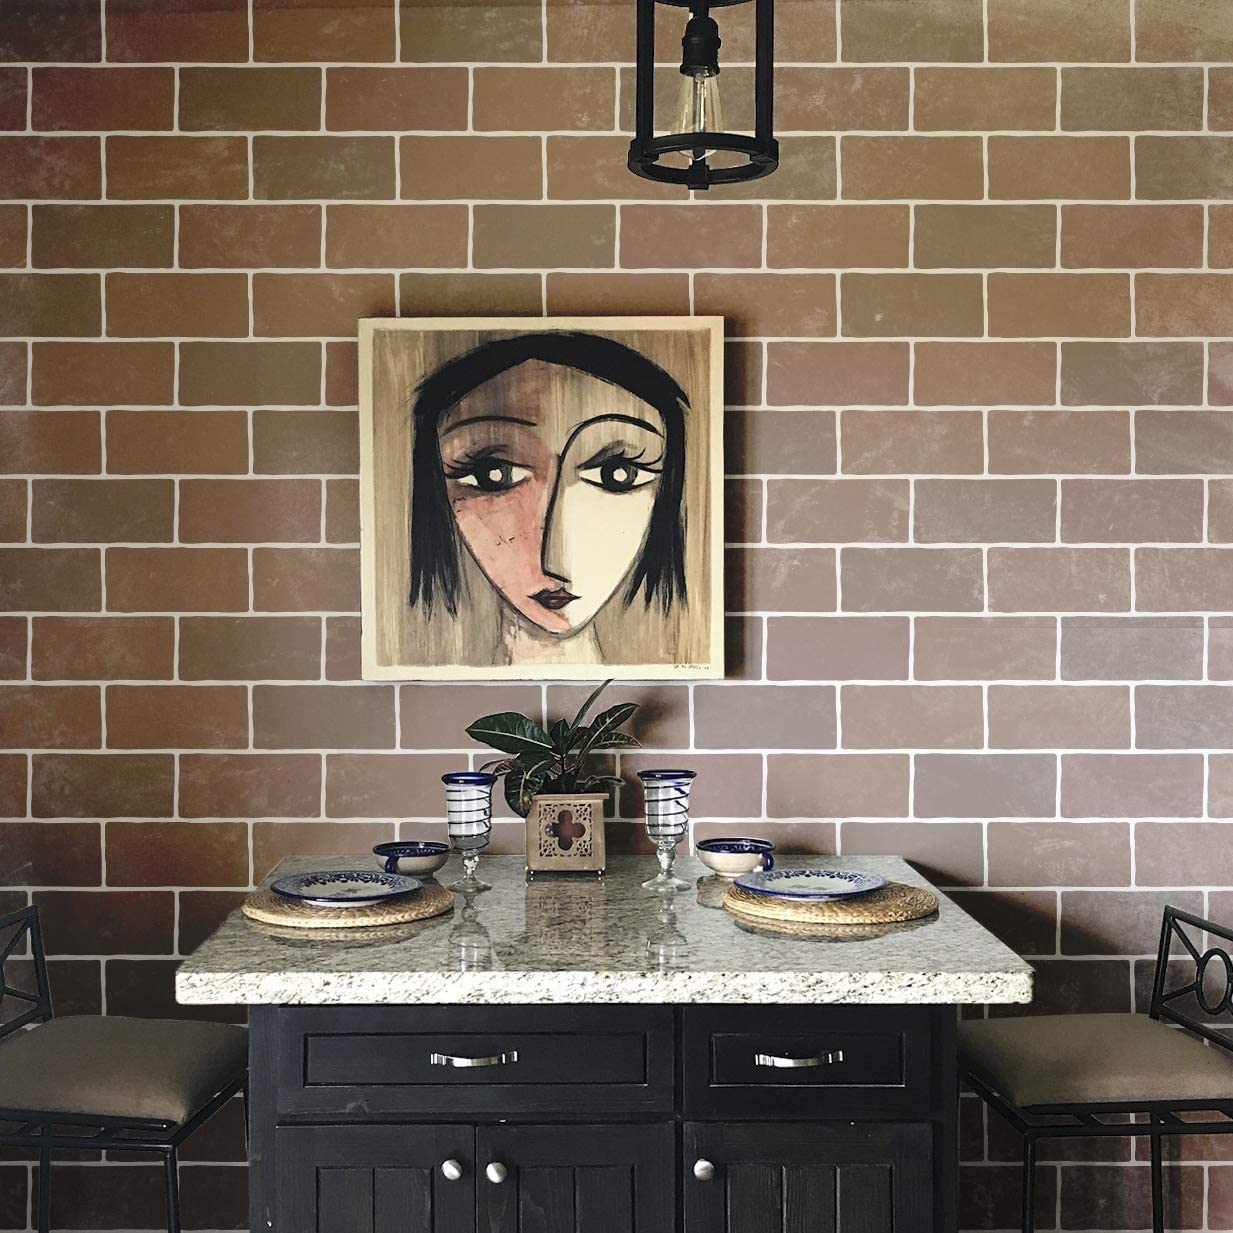 Amazon.com: Brick Wall Stencils - Faux Brick Wallpaper Design